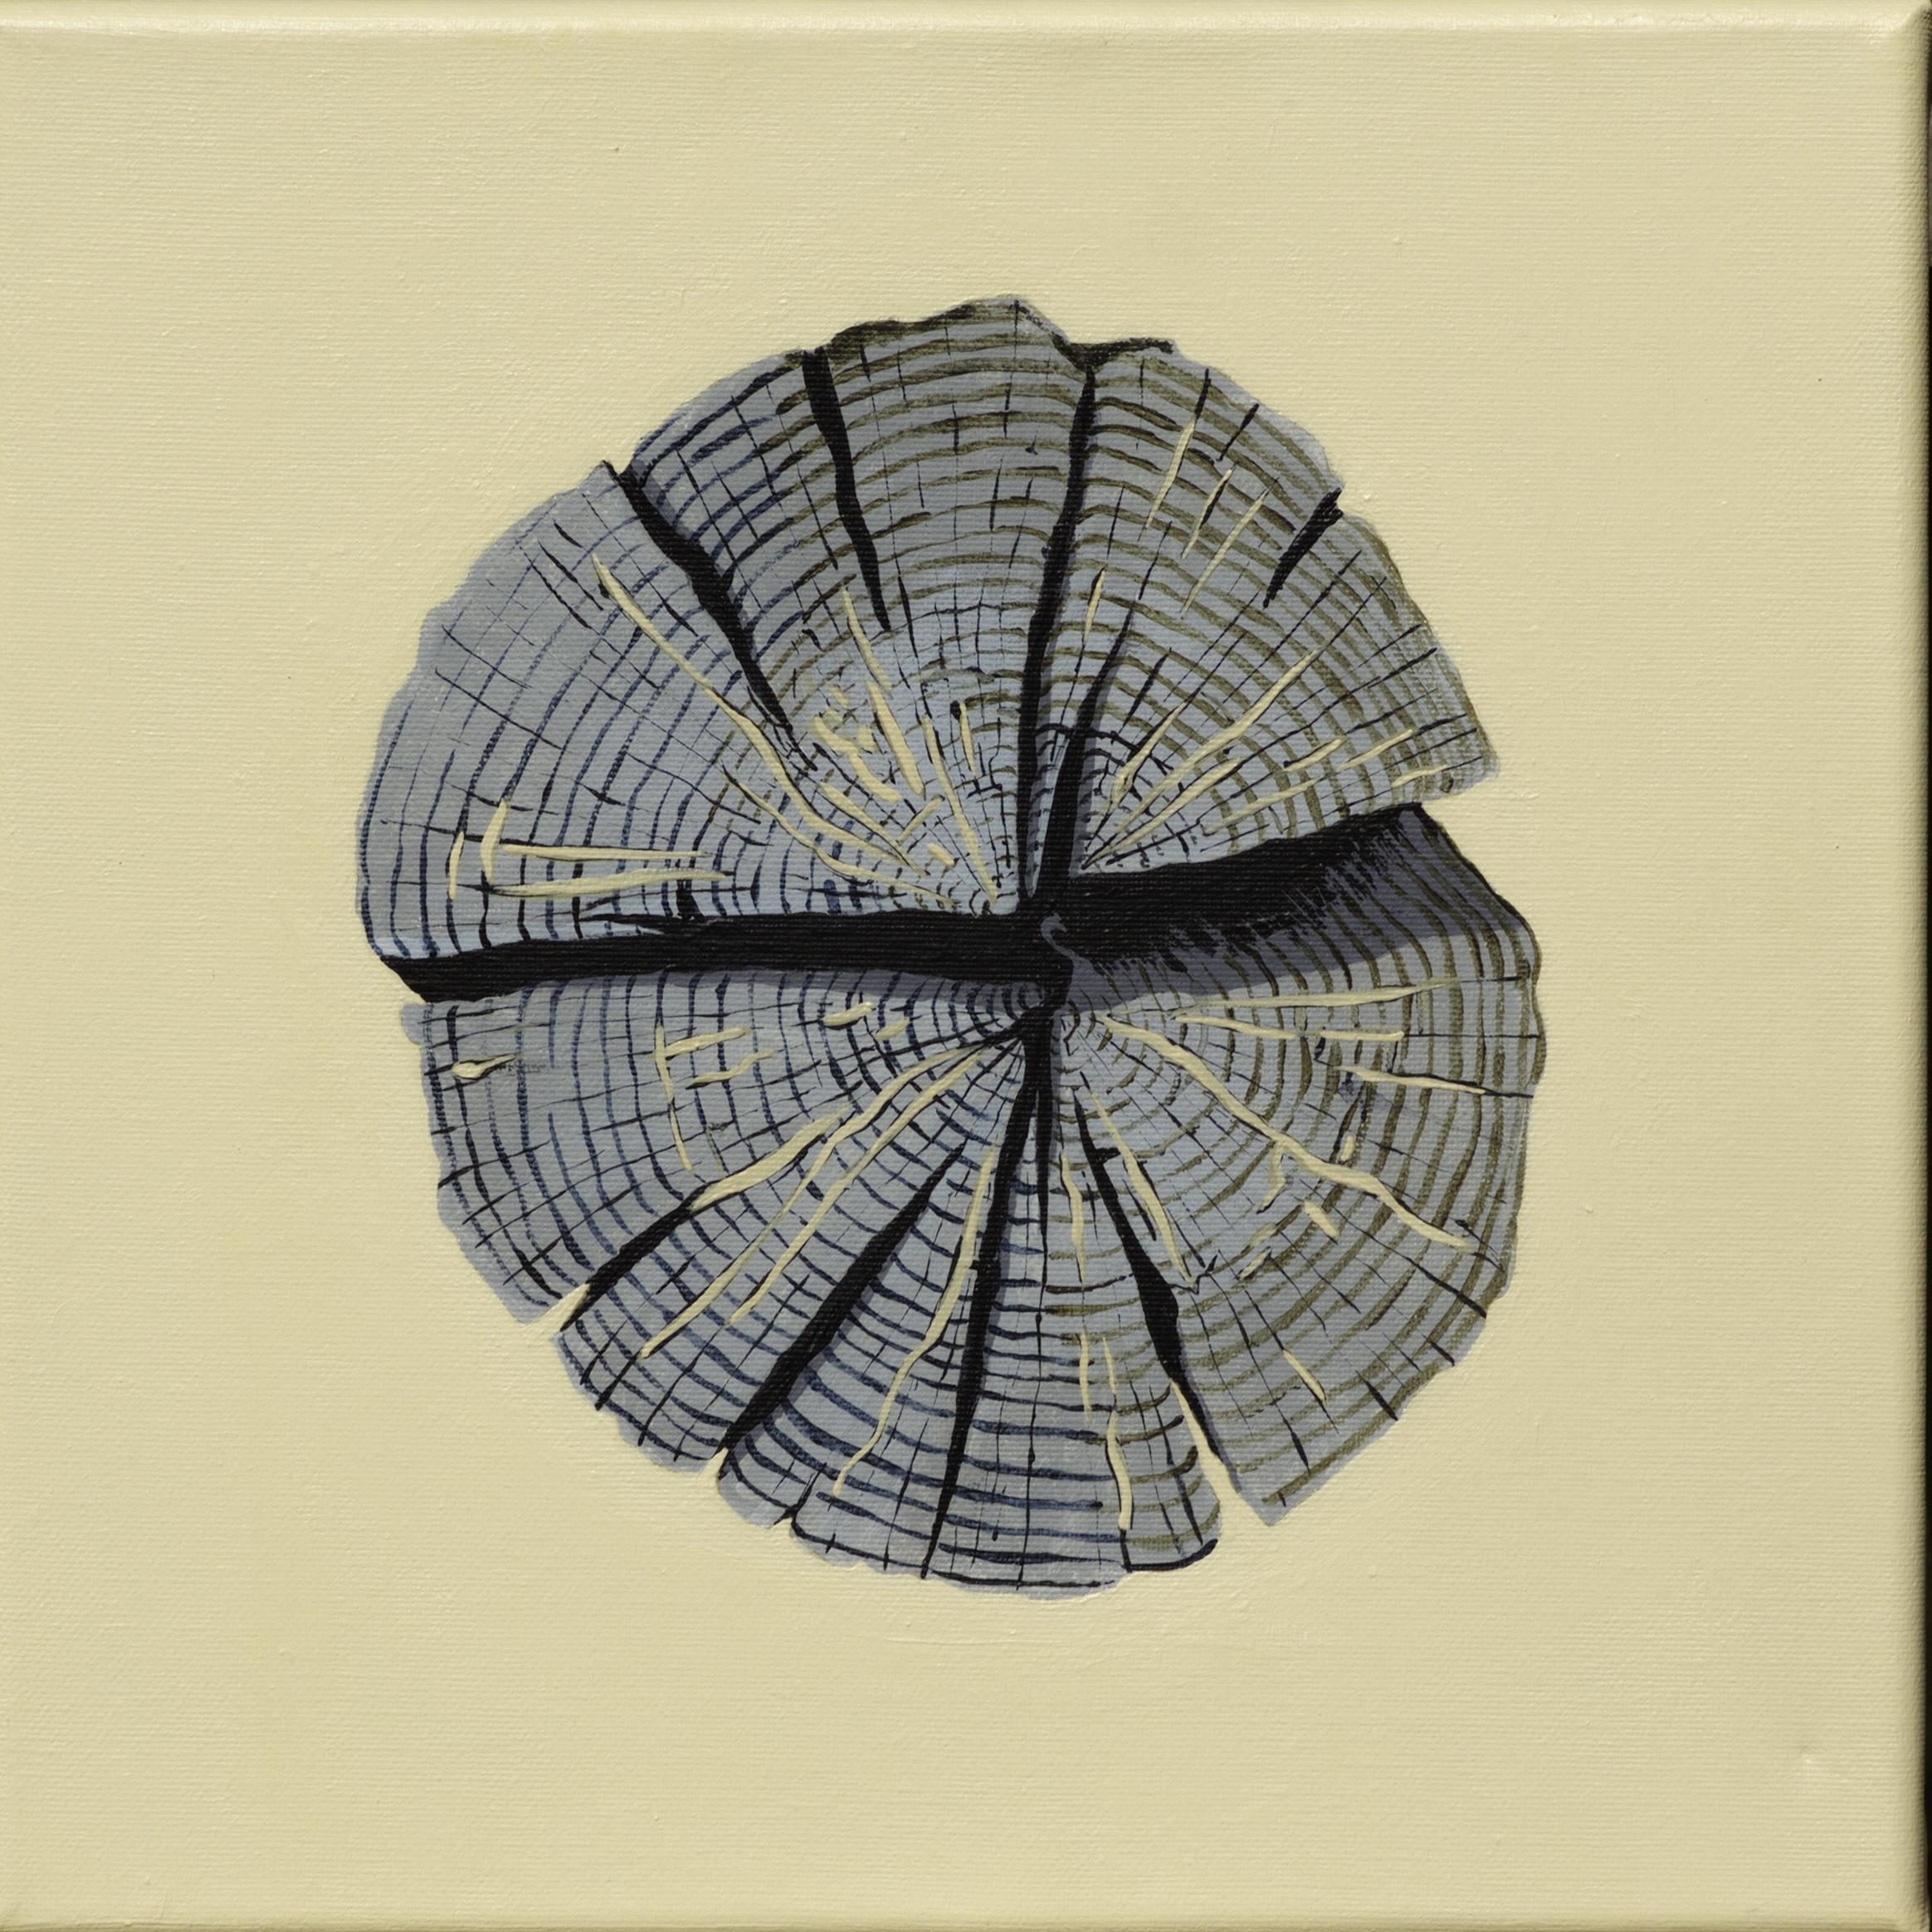 Paalkop 13 - acryl op canvas - 30 x 30 cm